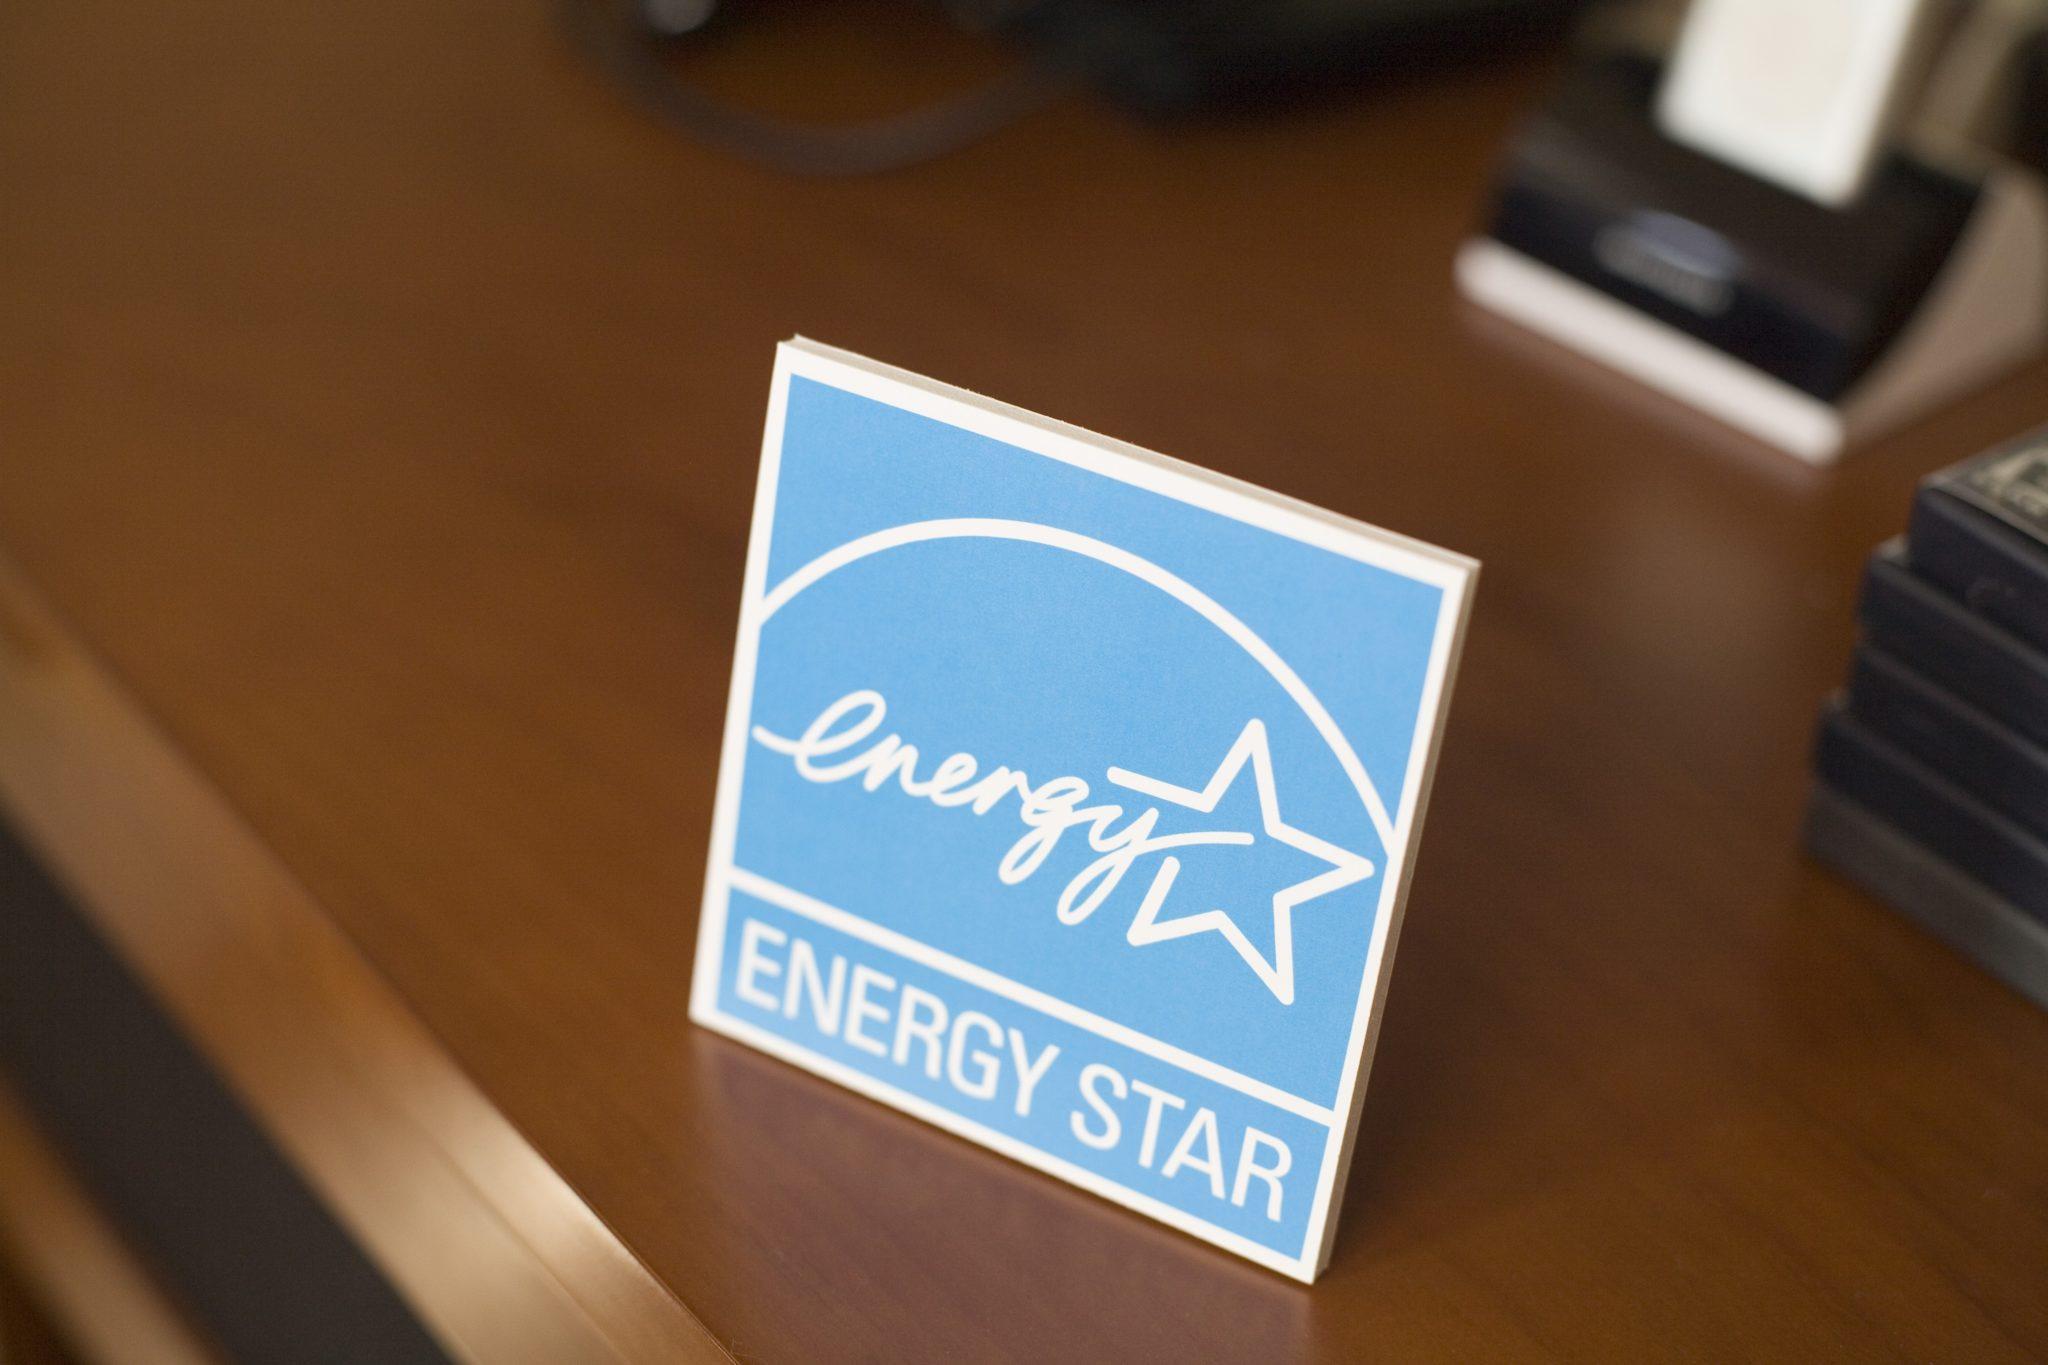 energy star, eco-friendly